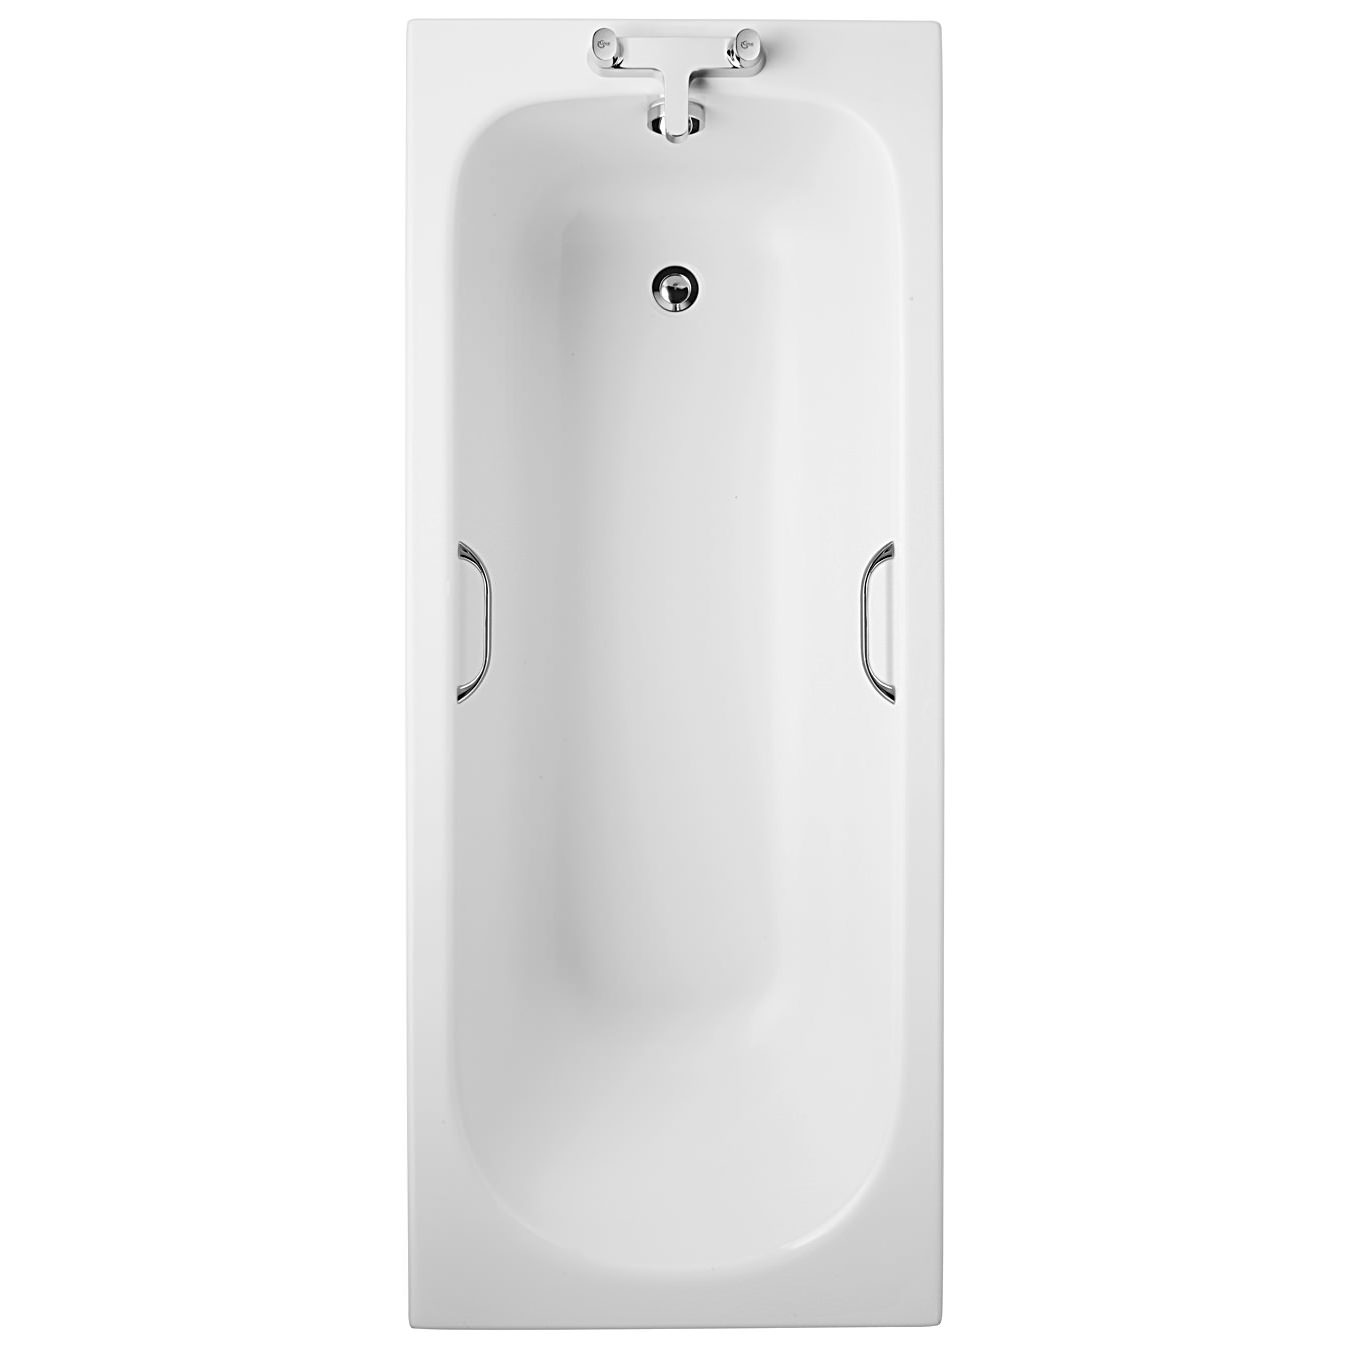 Ideal Standard Alto CT 1700 x 700mm Idealform Bath With Handgrips